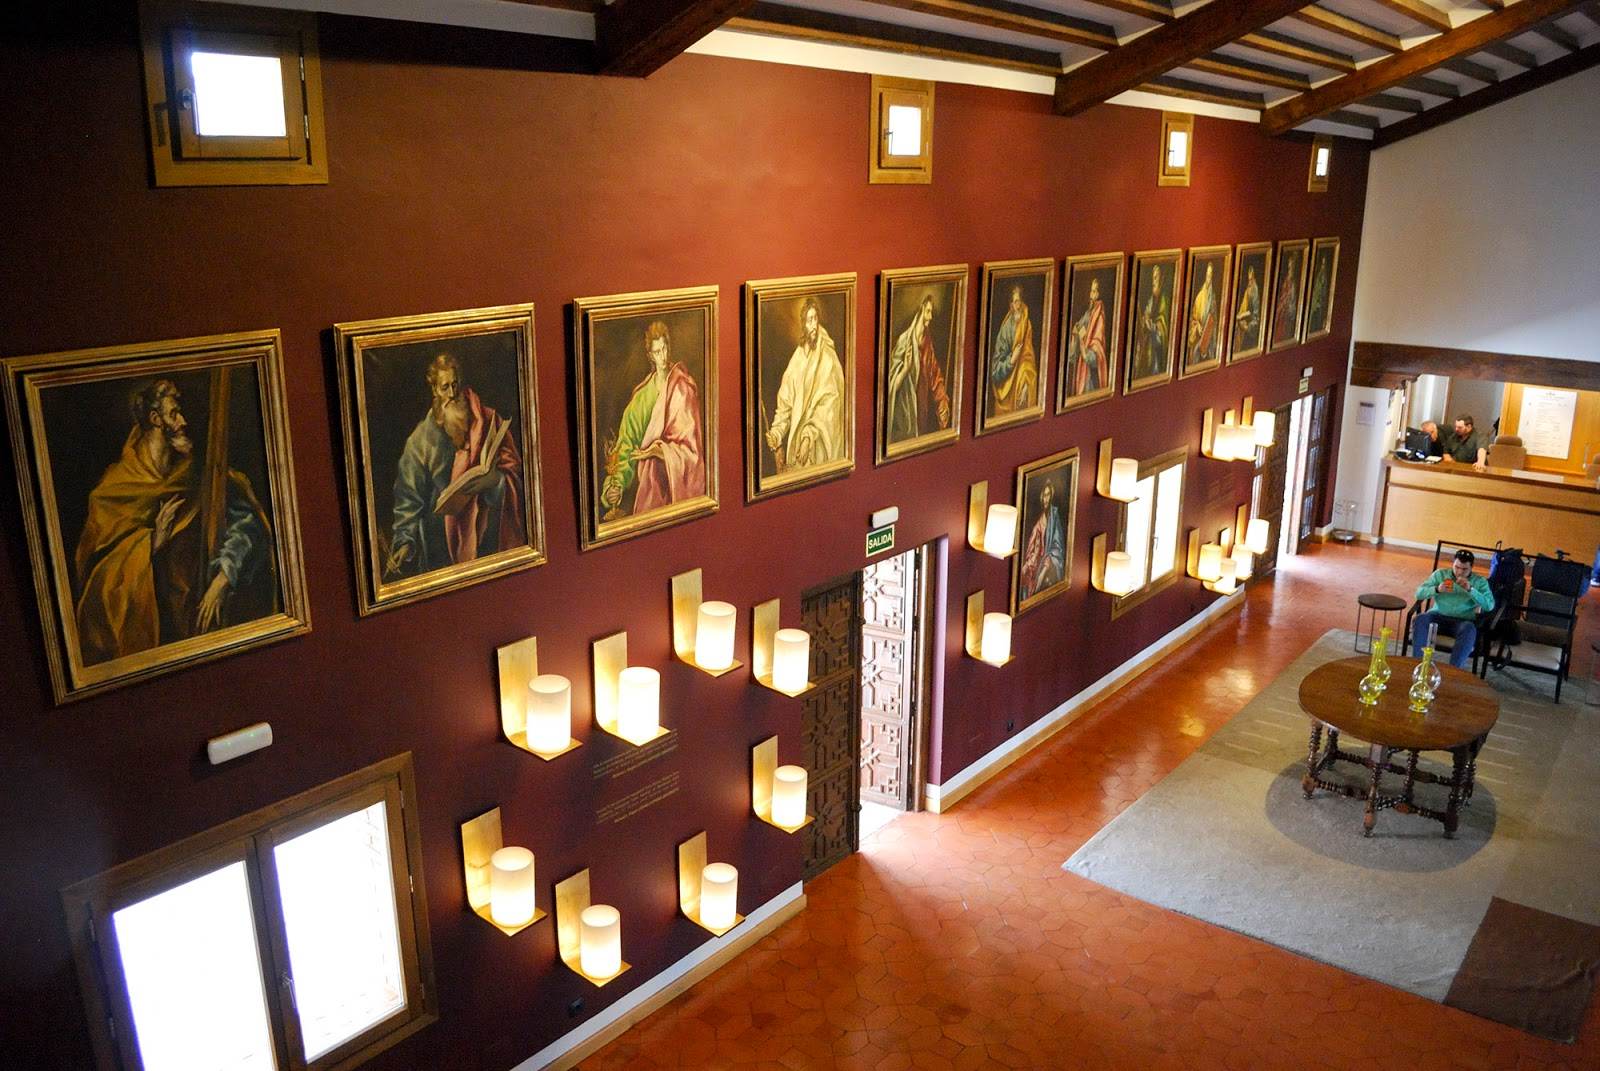 parador toledo spain hotel luxury restaurant vantage point